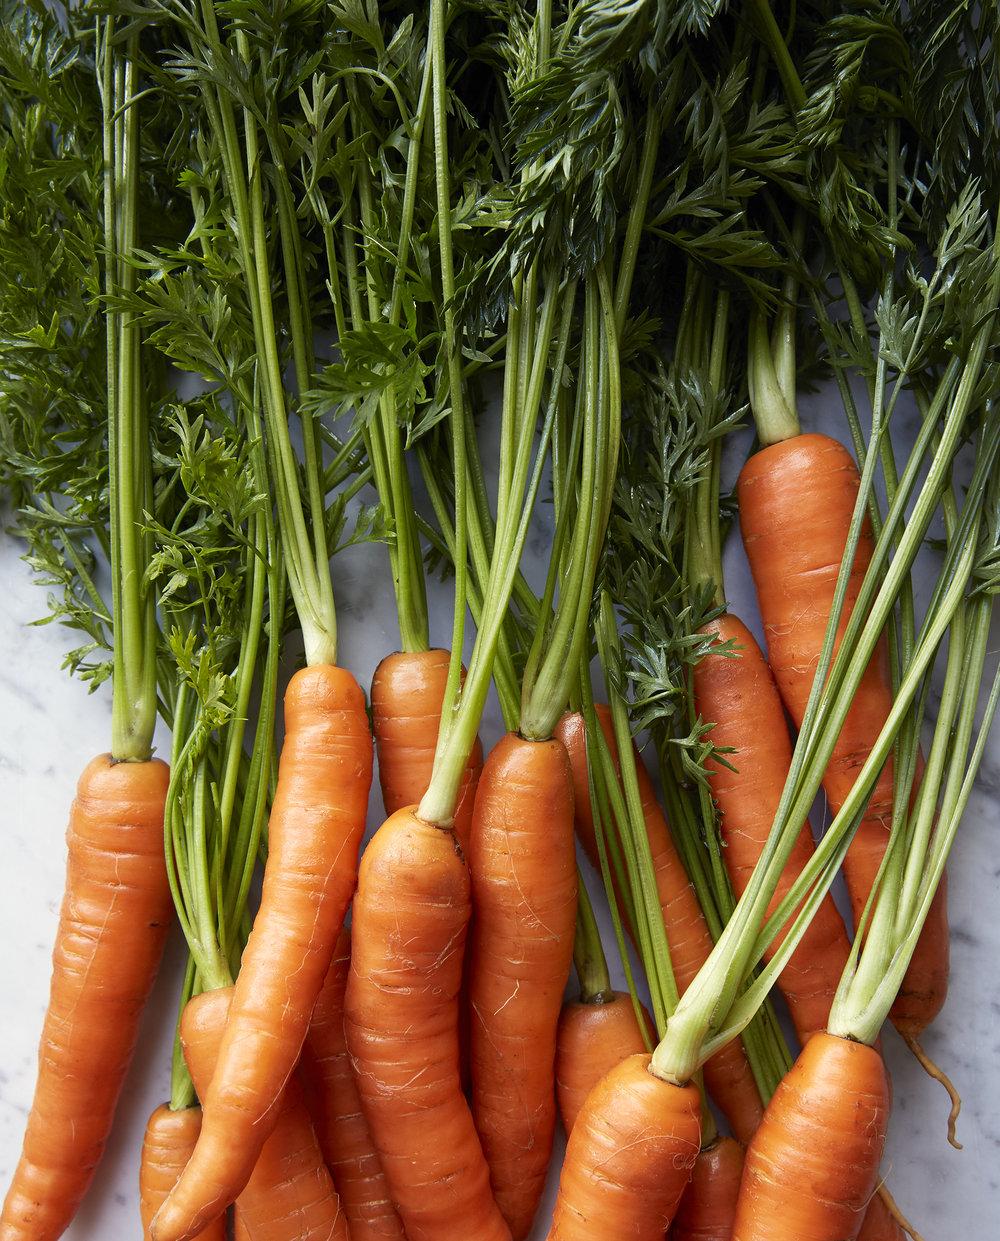 Burggraaf_Charity-Seattle_Food_Photographer-Carrots.jpg